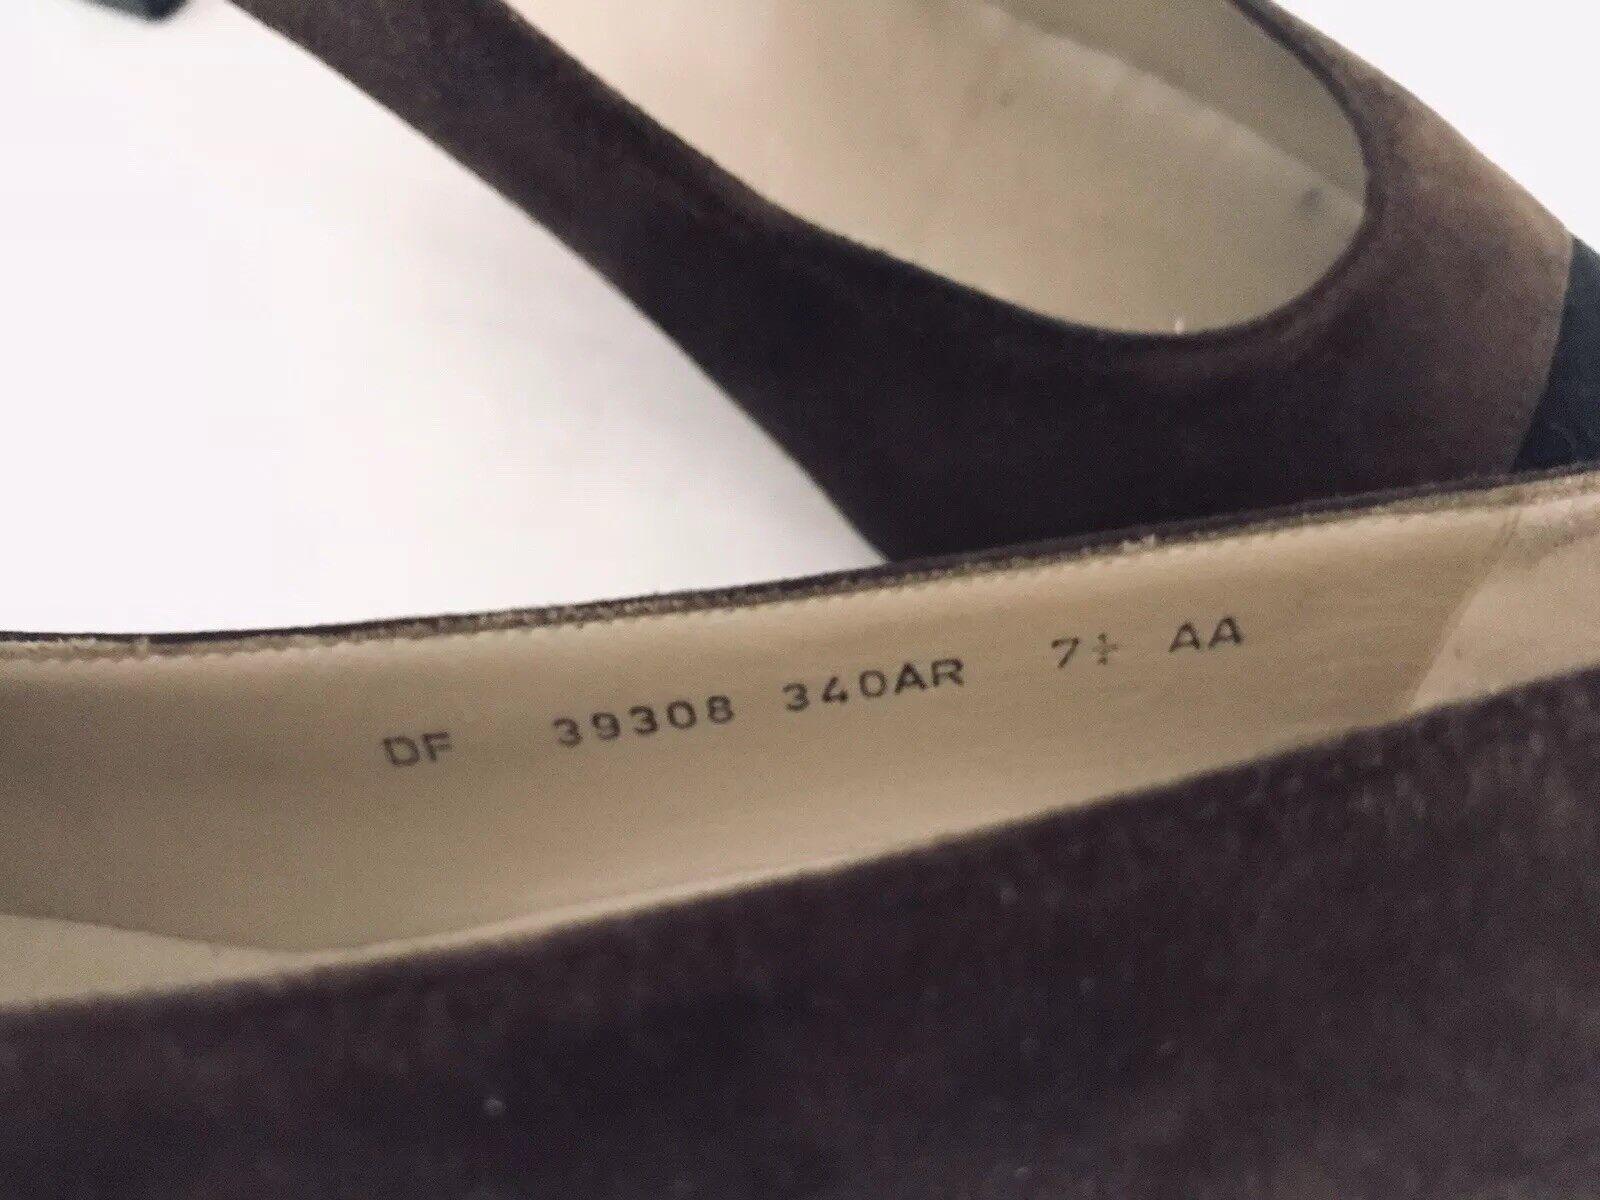 Salvatore Ferragamo Womens Cap Toe Pump Size 7.5 AA AA AA Narrow Brown Suede Kitten 767929